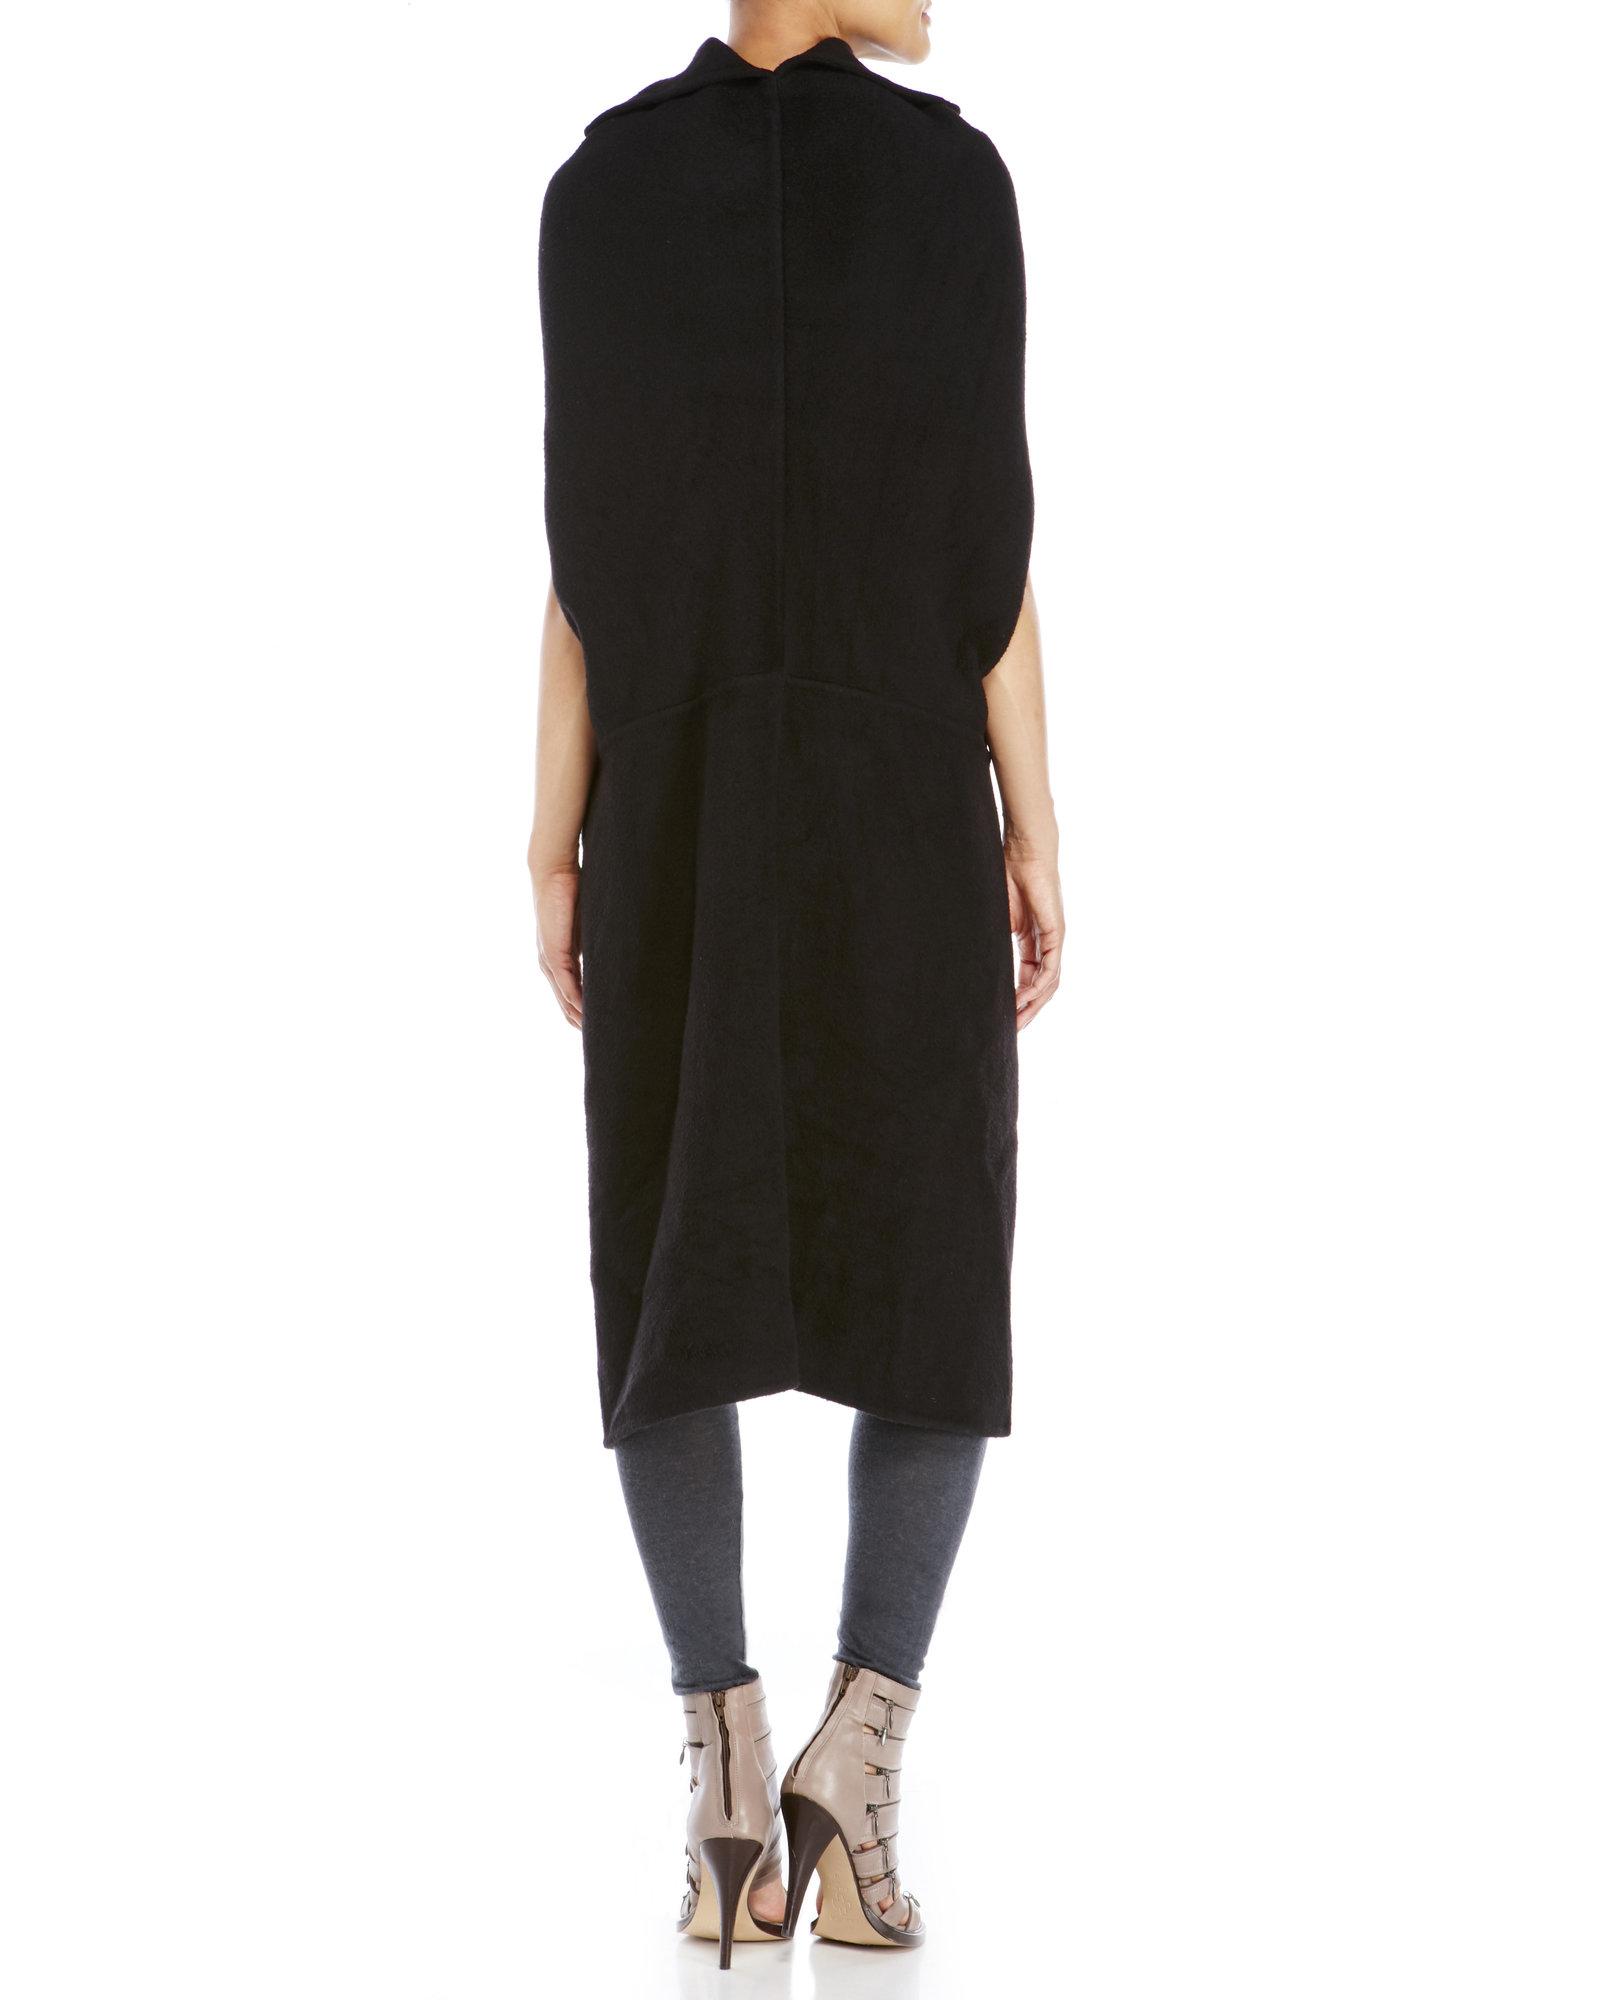 Rick Owens Black Cashmere Shroud Sweater